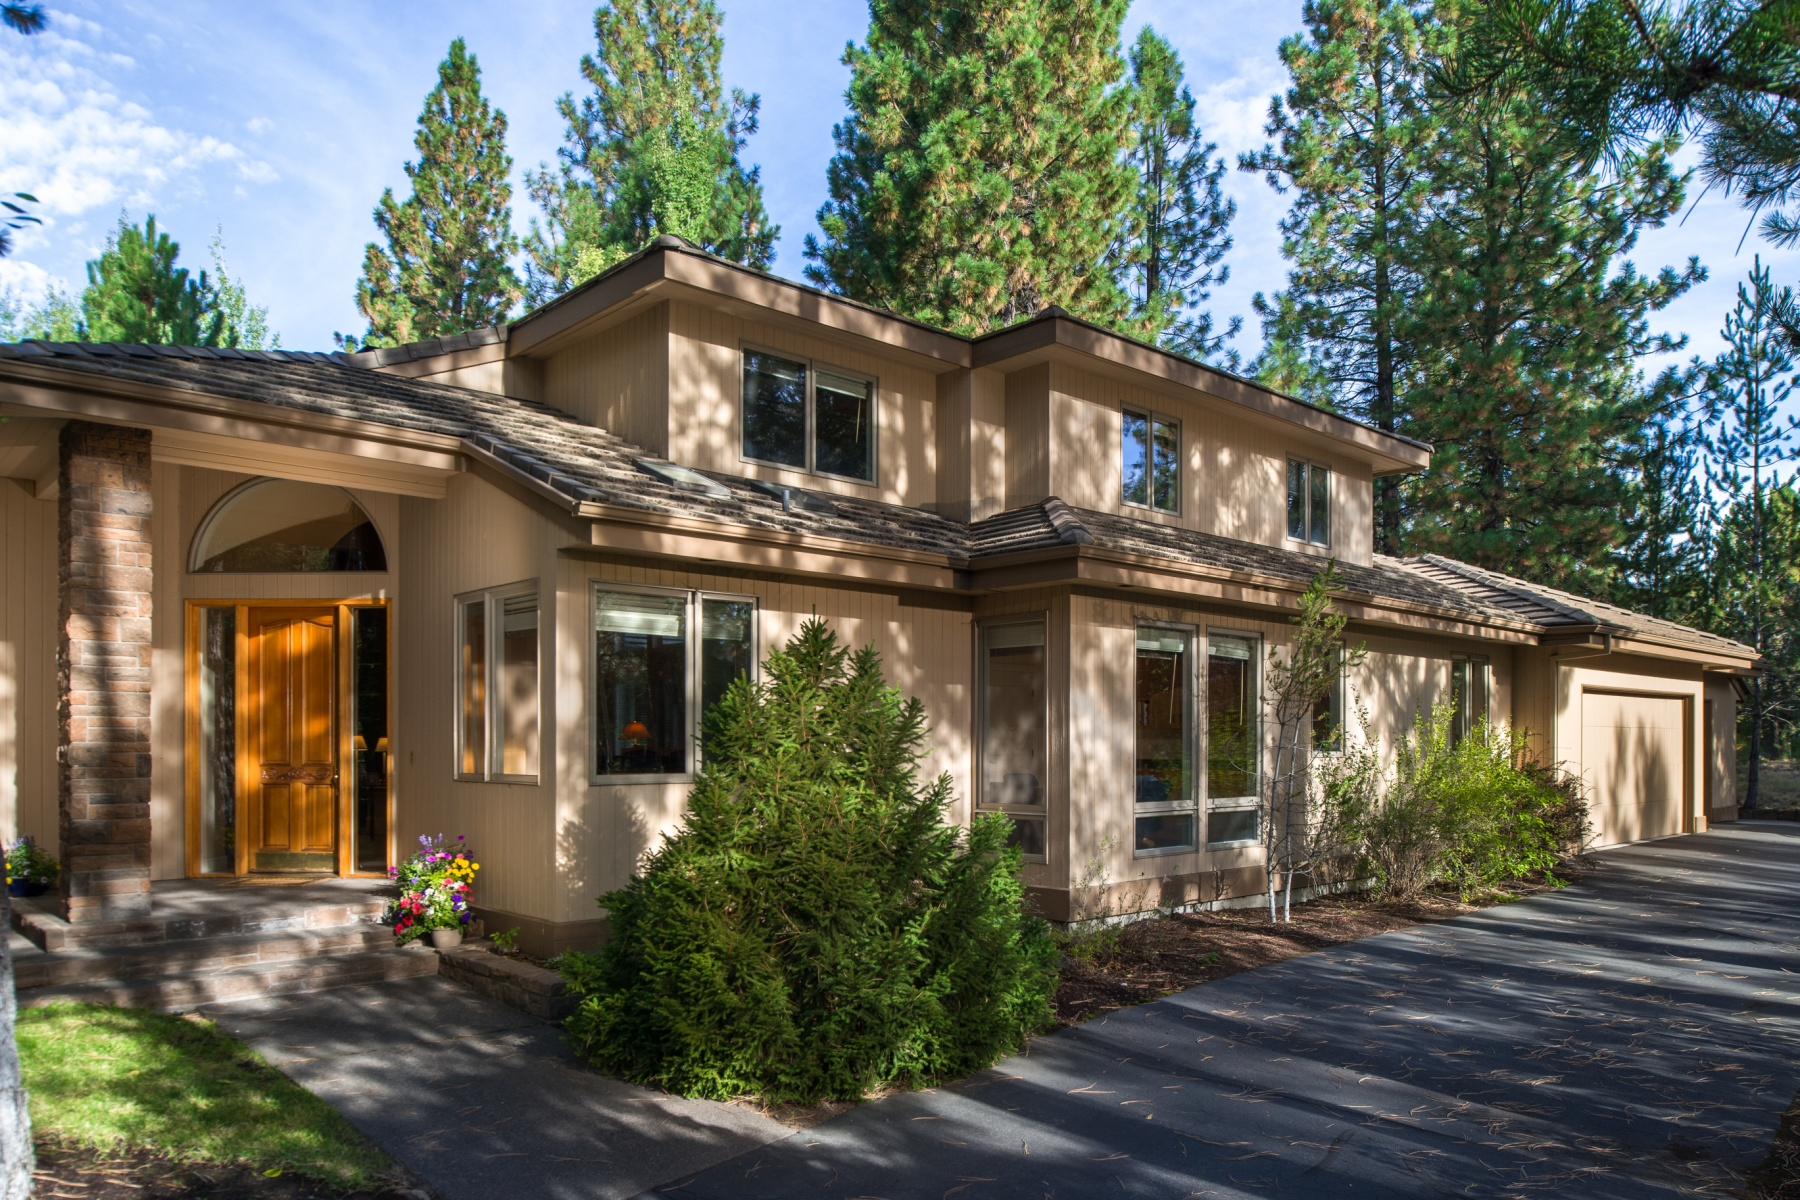 Casa para uma família para Venda às Broken Top 61861 Bunker Hill Ct Bend, Oregon 97702 Estados Unidos